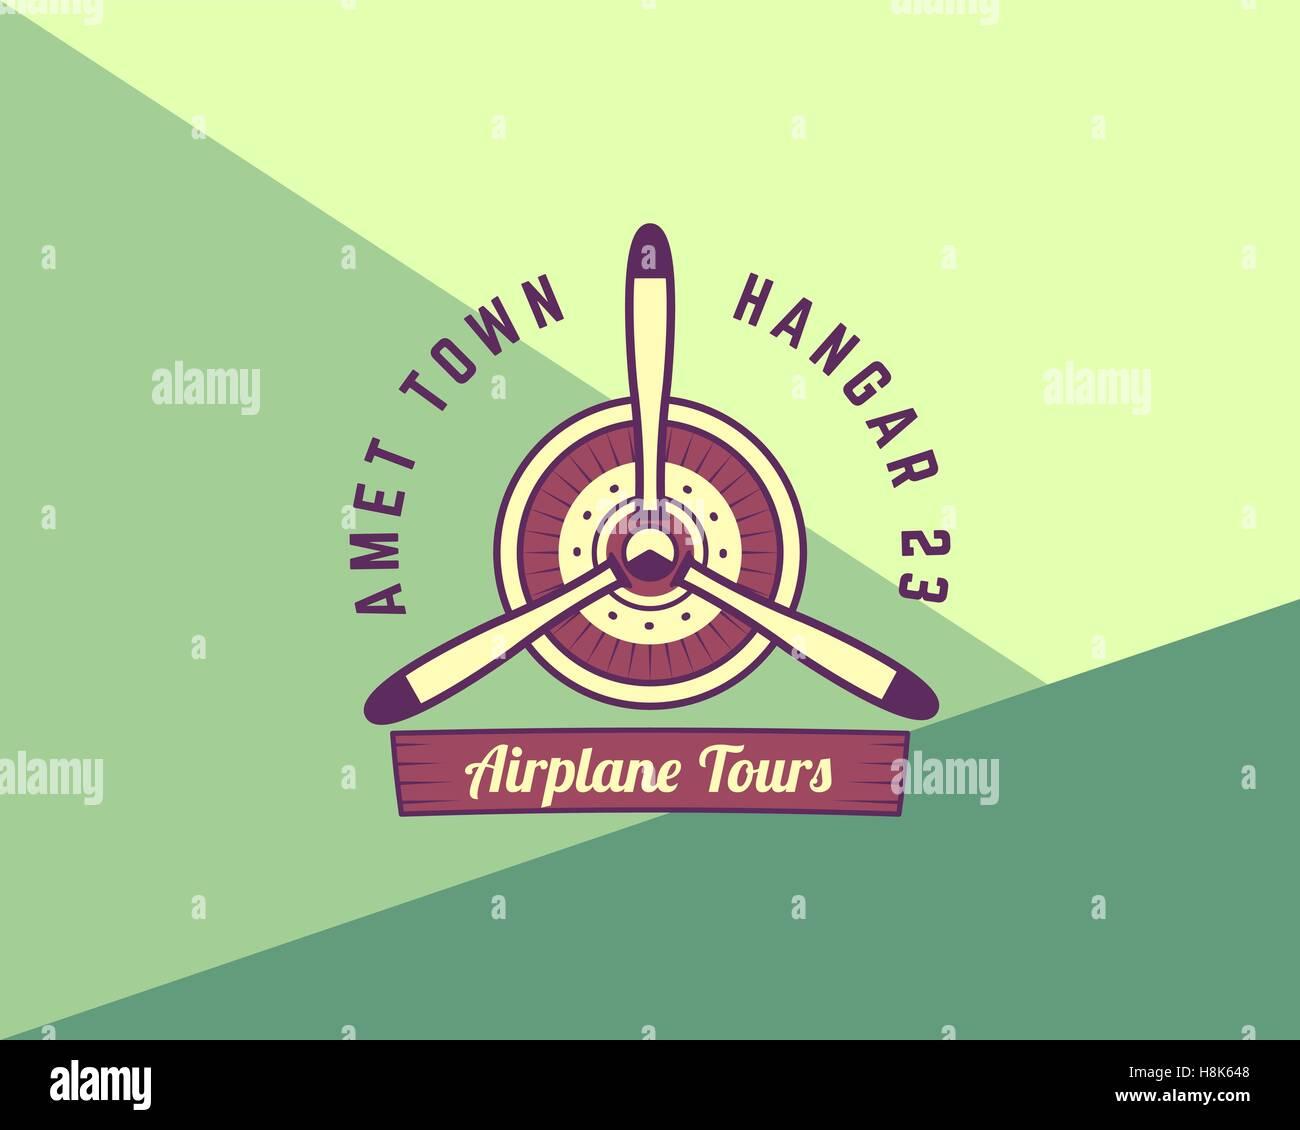 Shirt design elements - Airplane Propeller Emblem Biplane Label Retro Plane Badge Design Elements Vintage Prints For T Shirt Aviation Stamp Air Sh